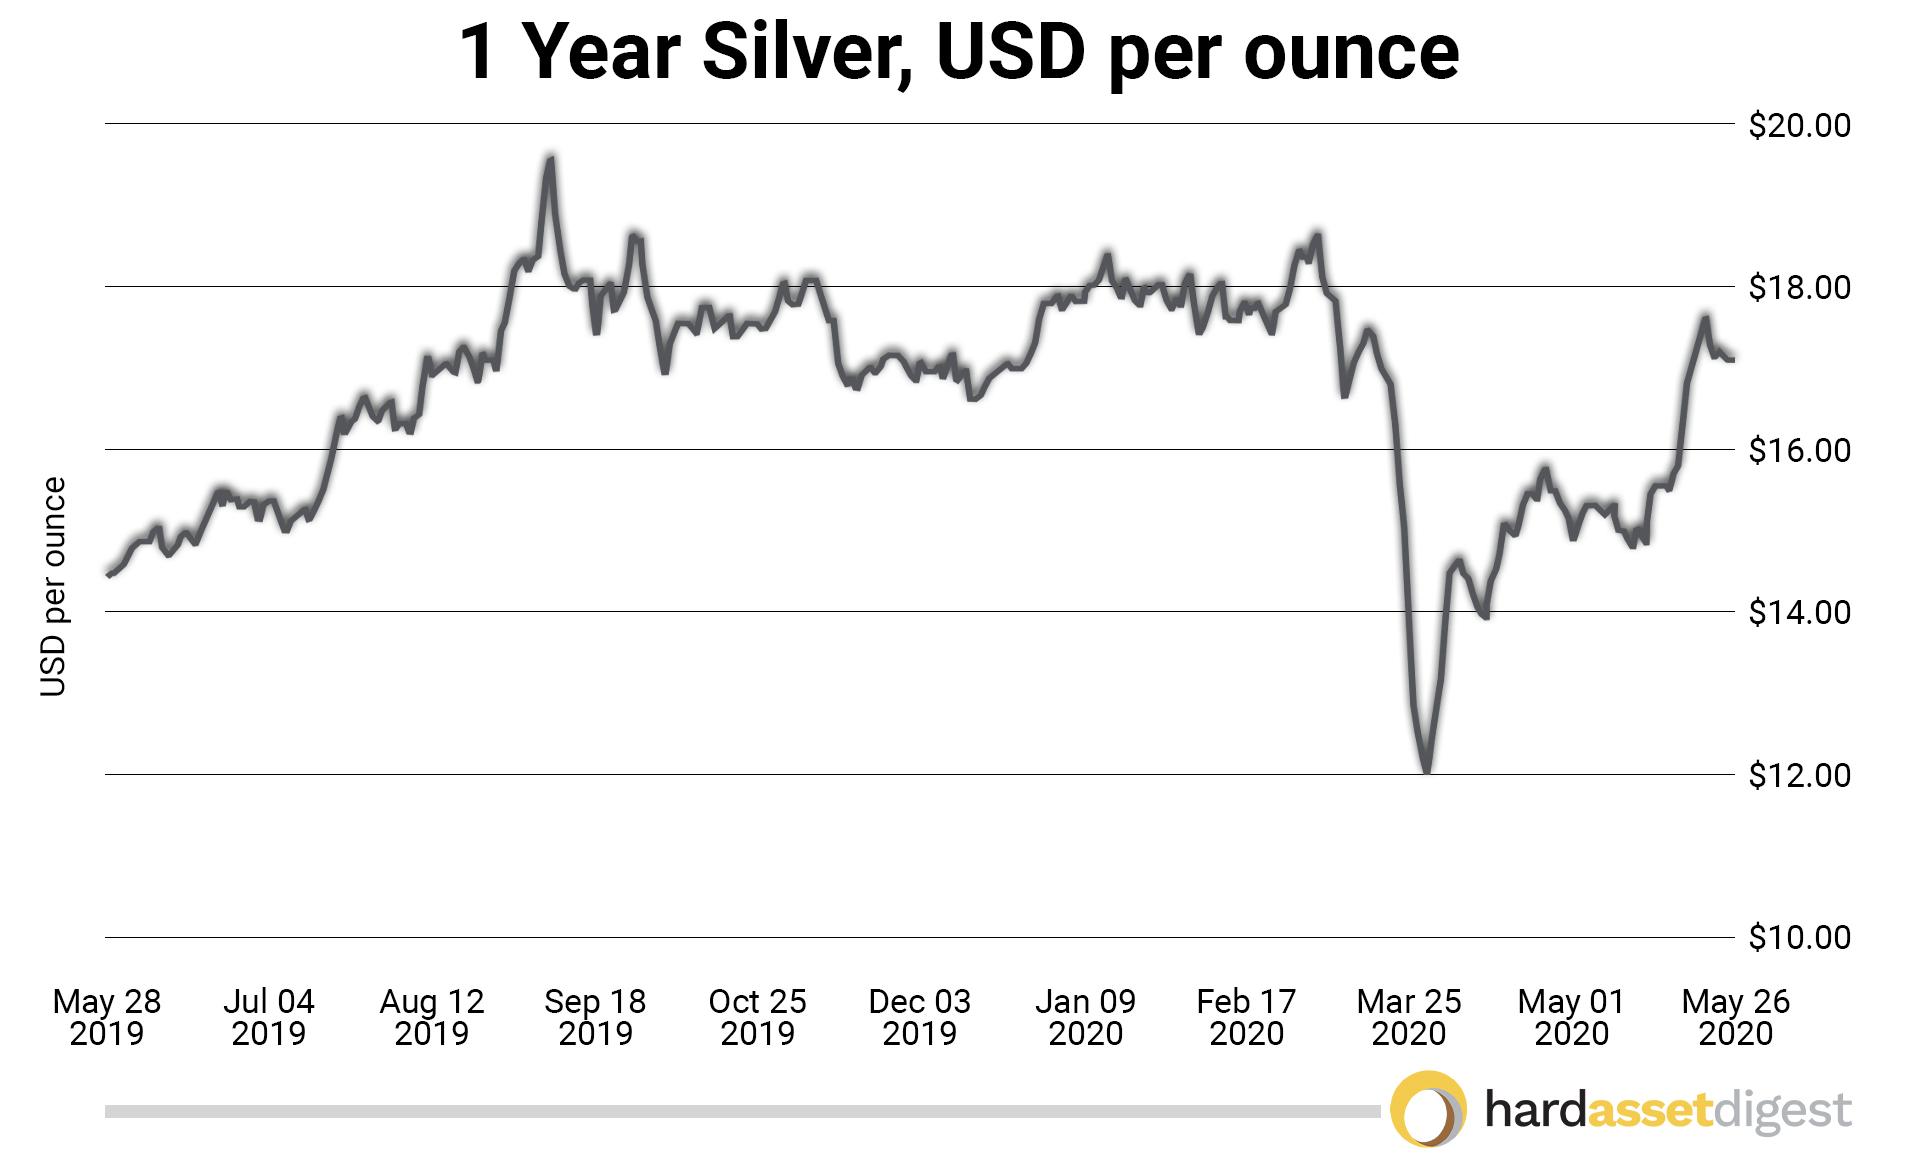 1year-silver-usd-per-ounce